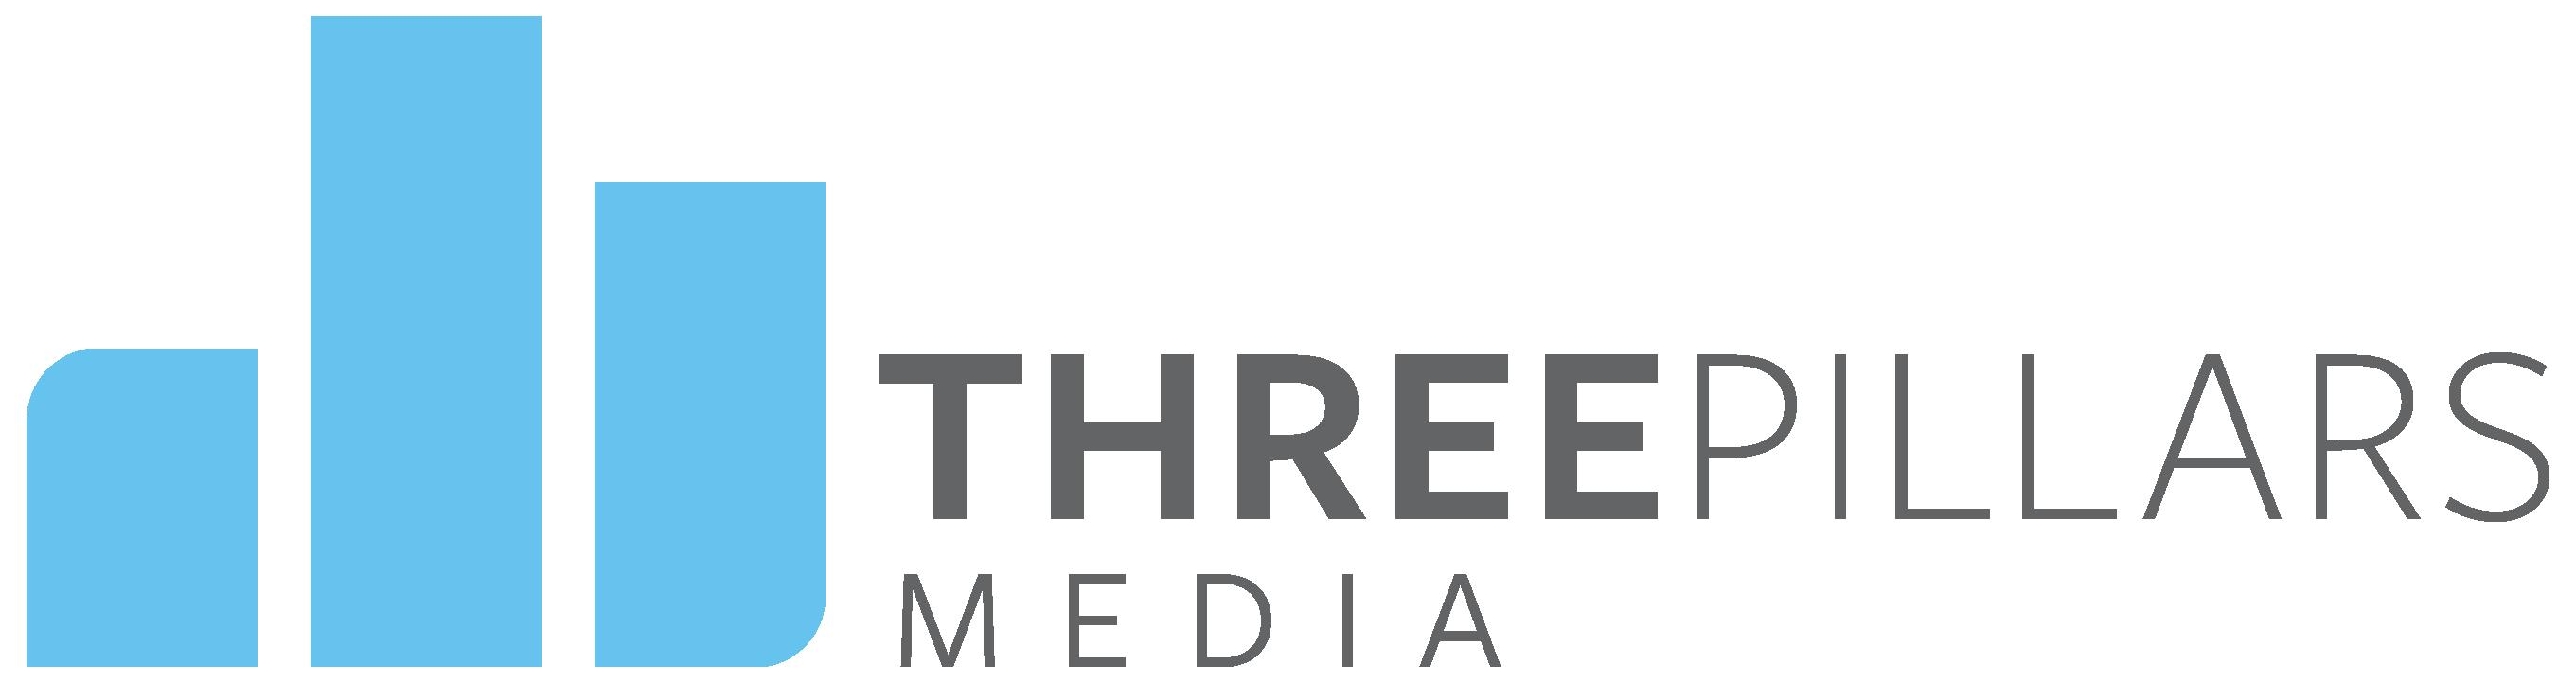 Three Pillars Media